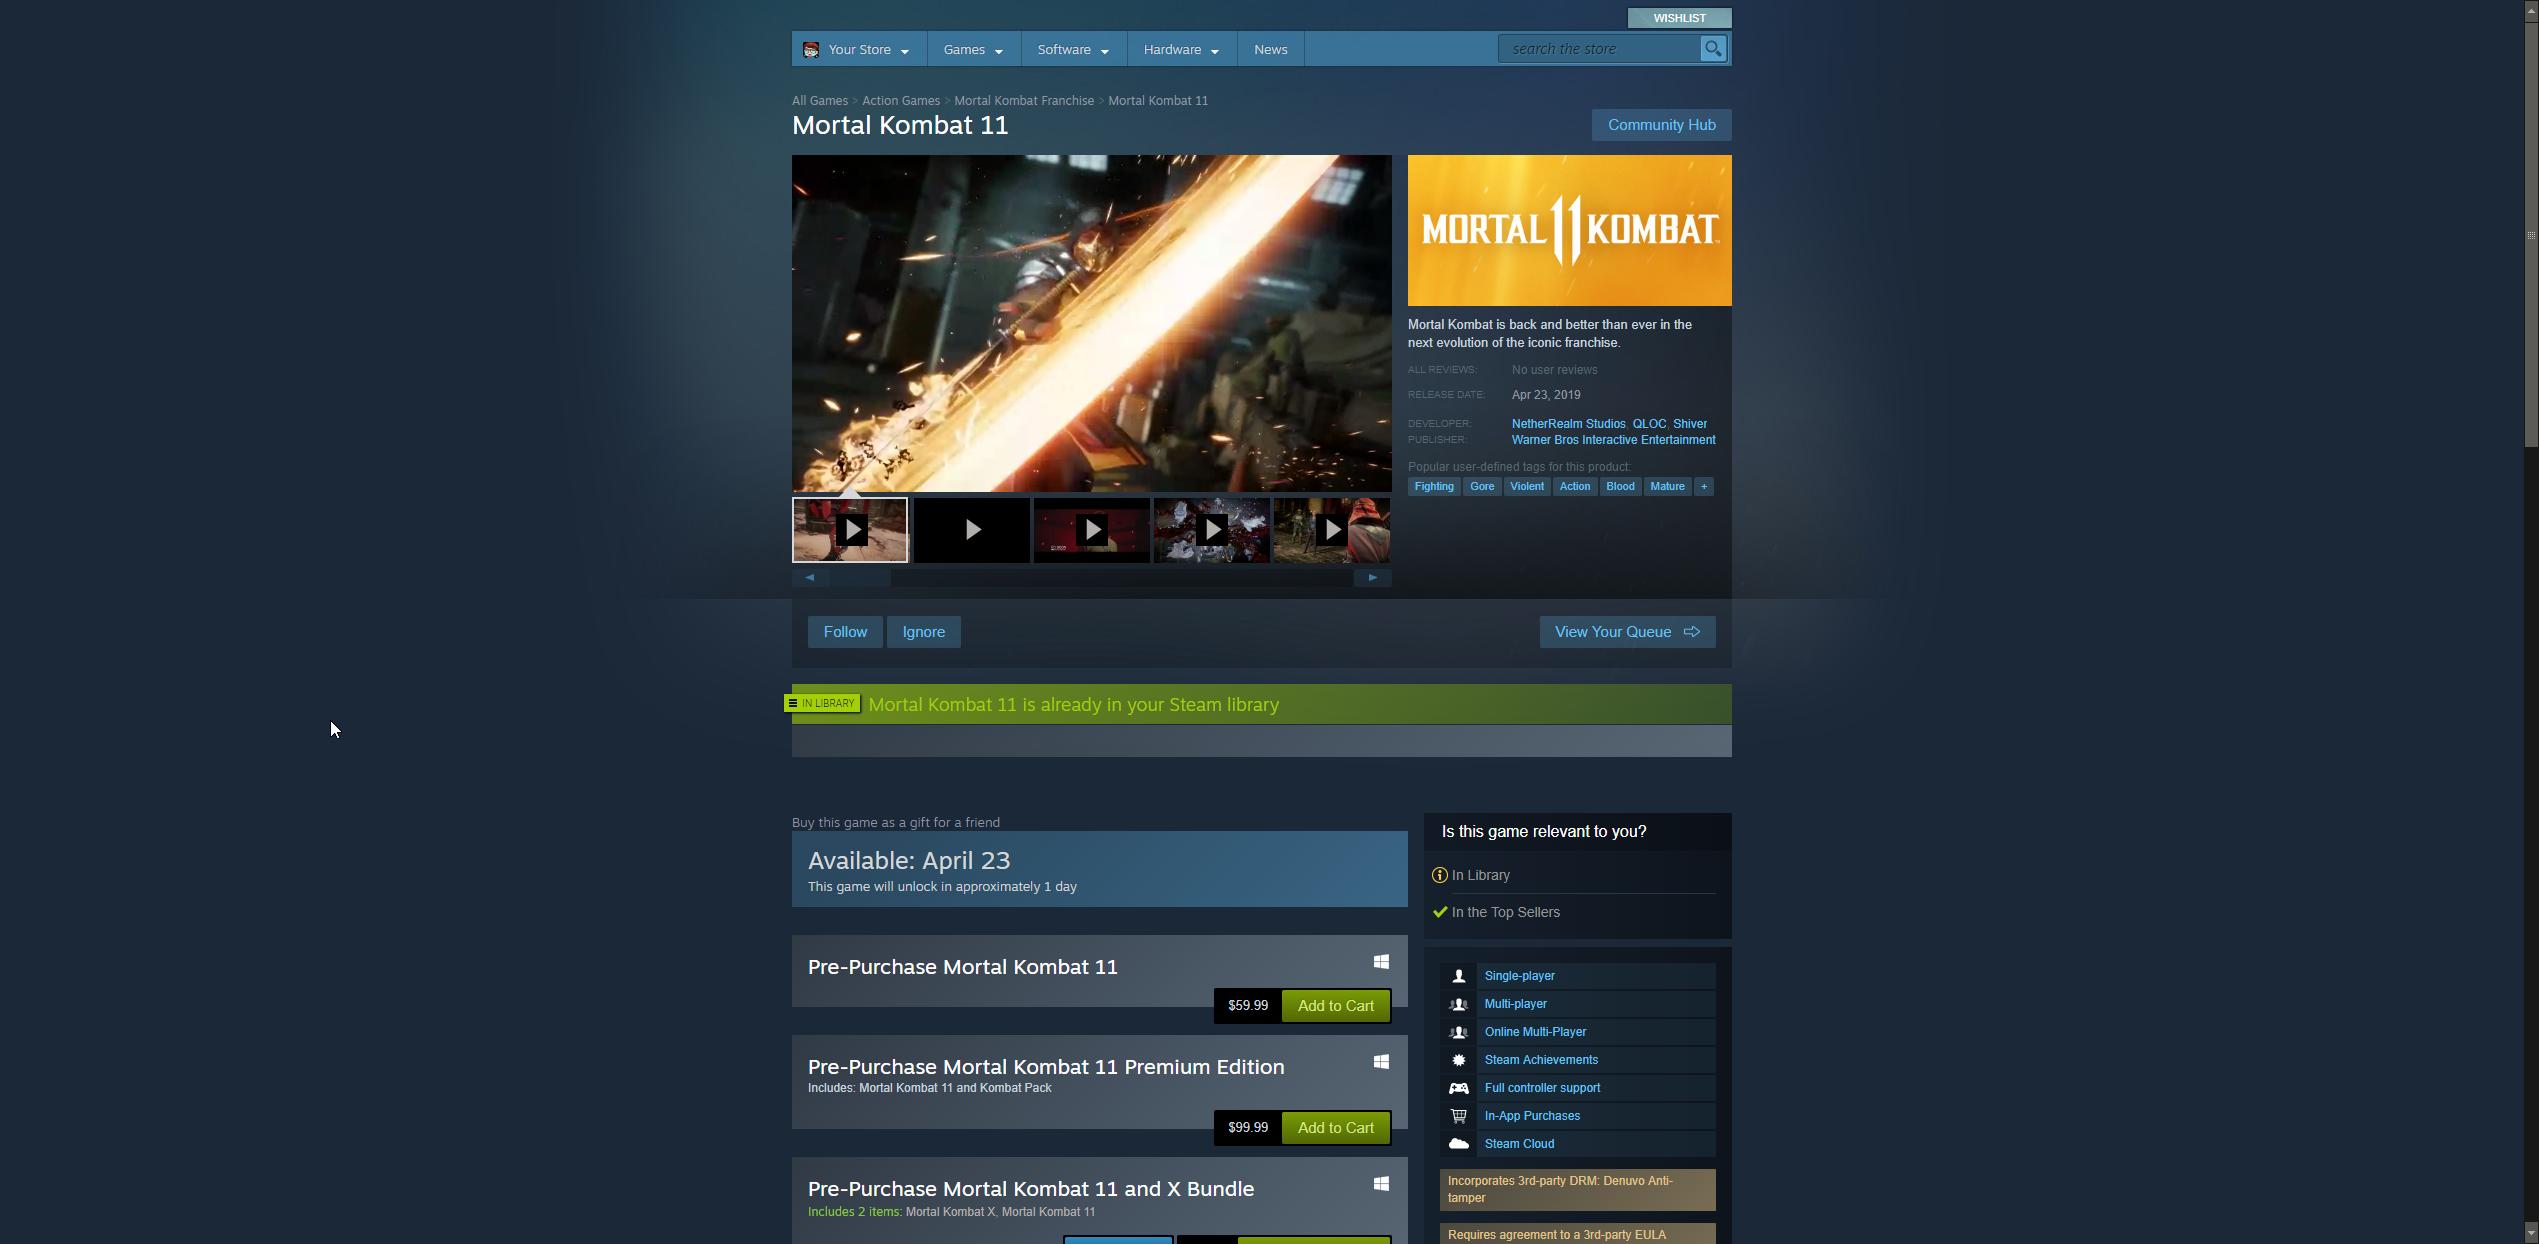 Mortal Kombat 11 steam release timer